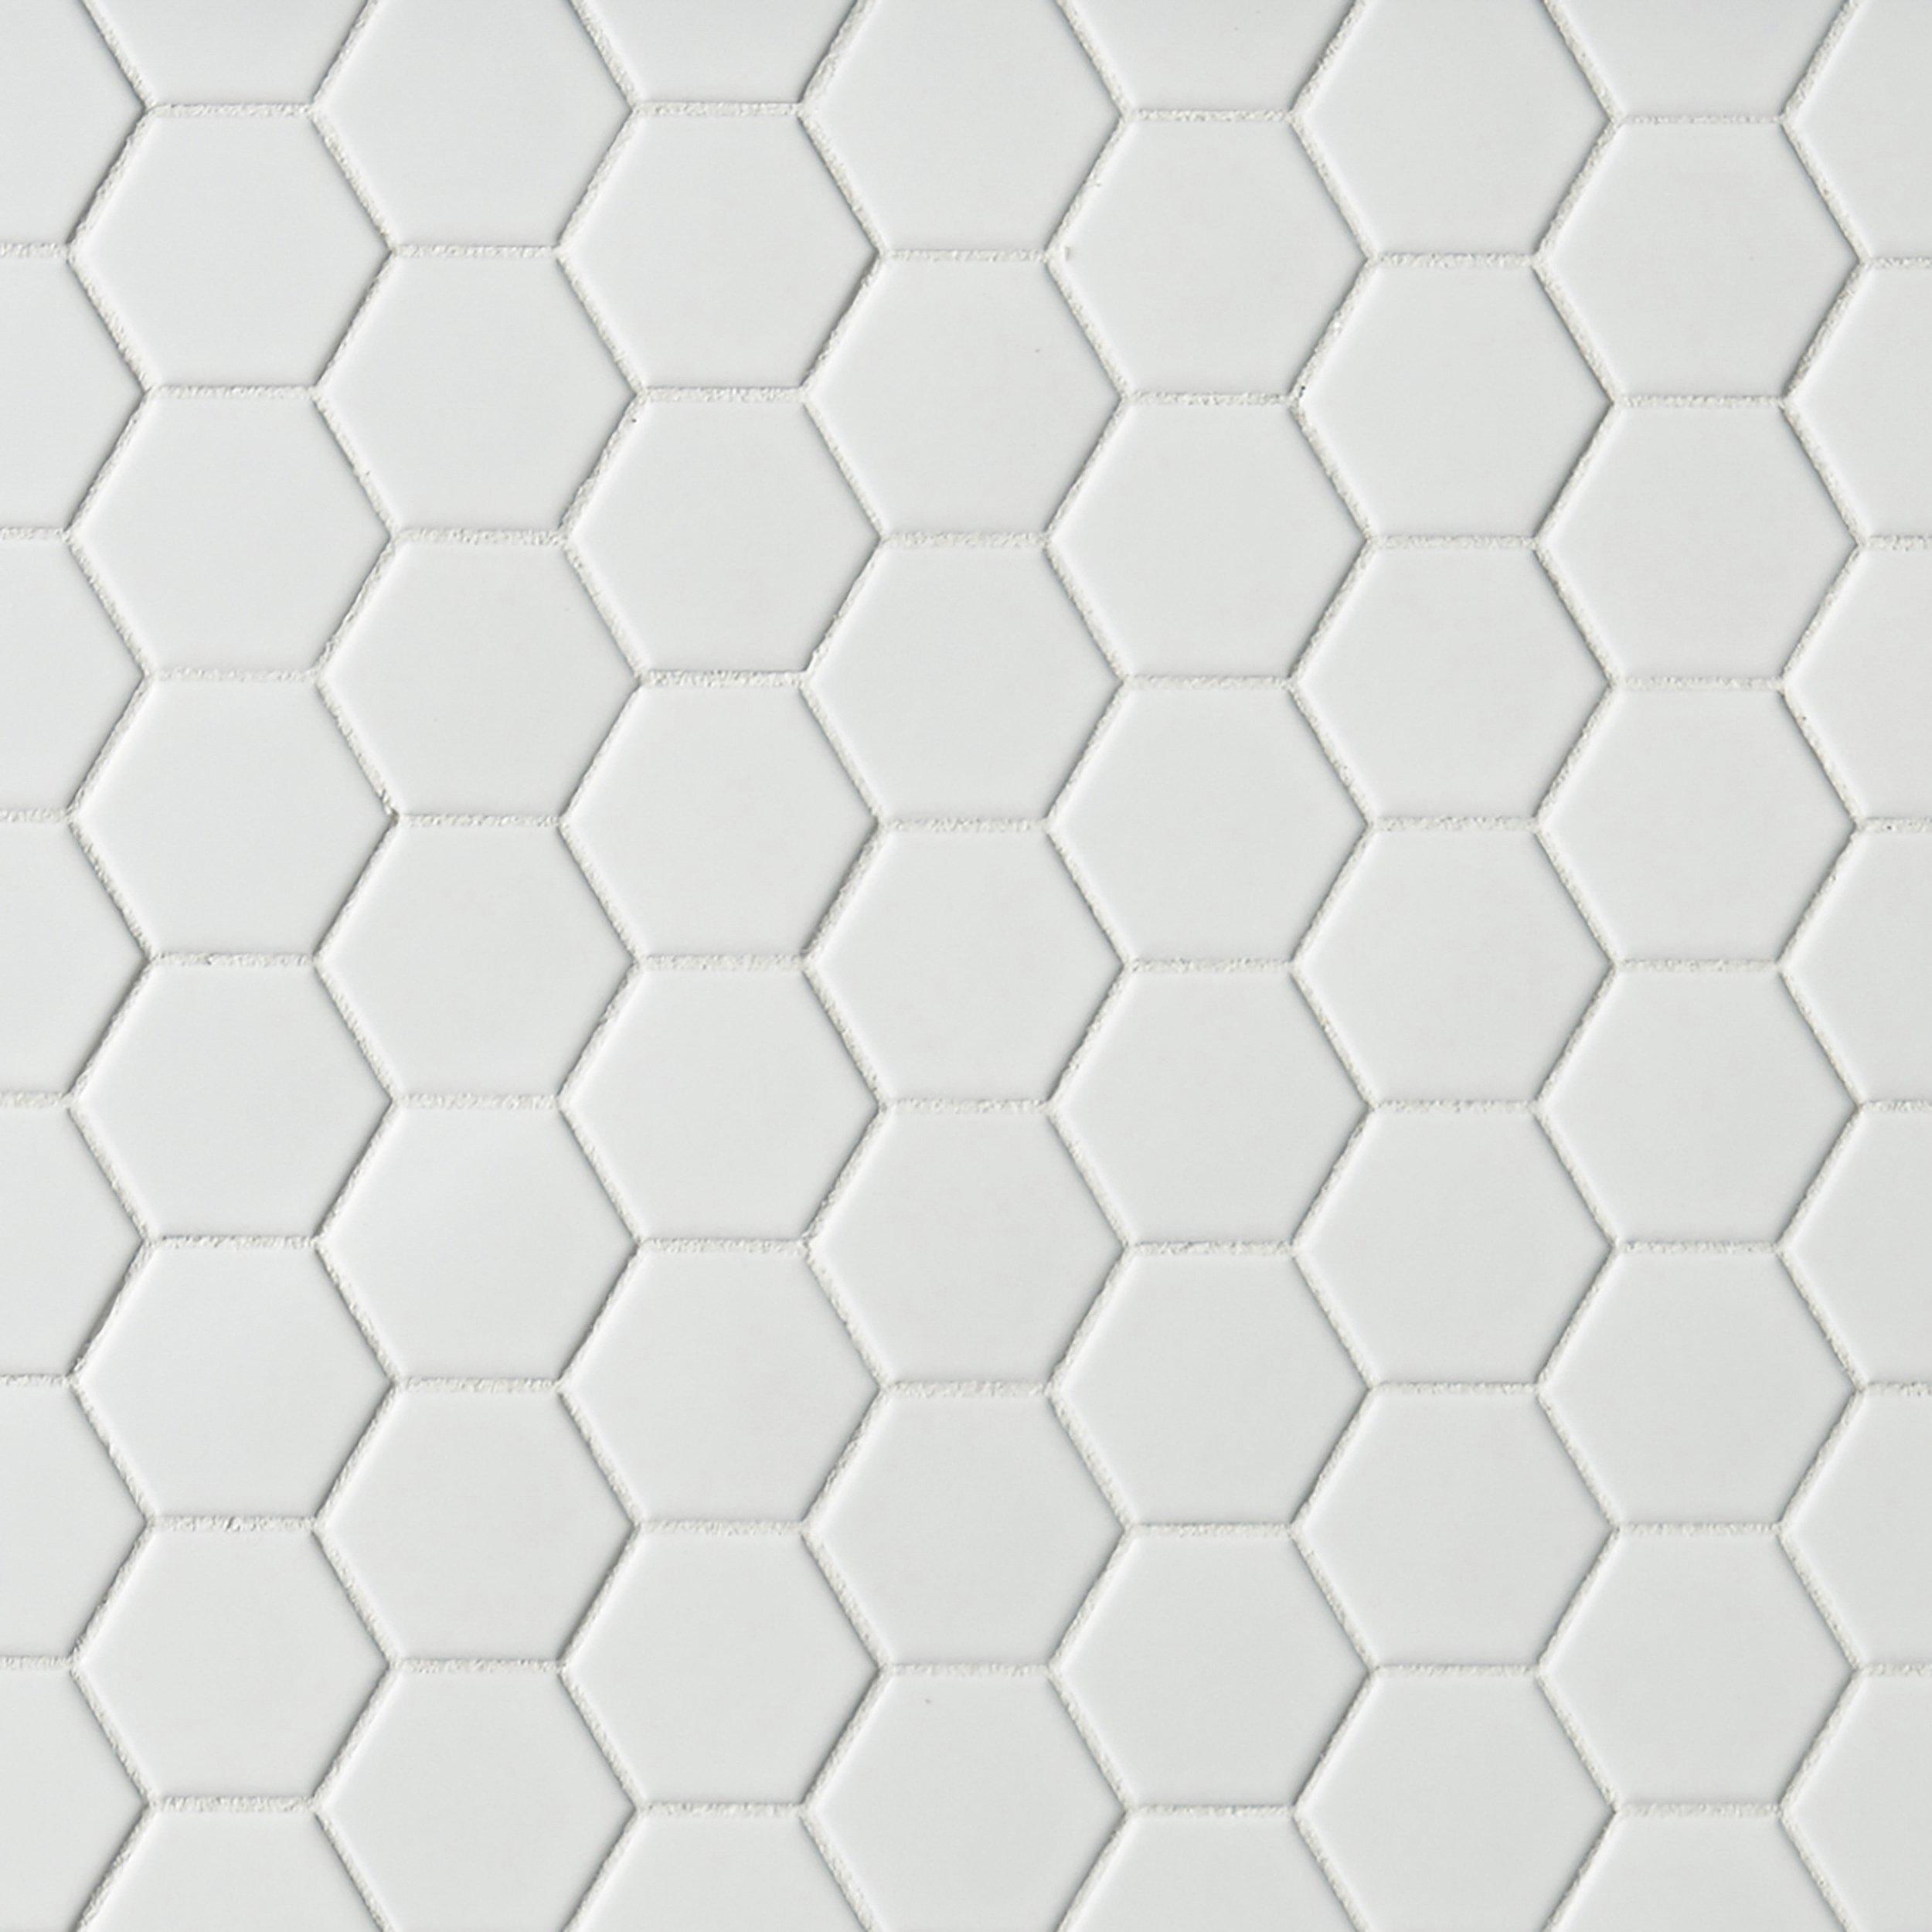 Metro White Matte Hexagon Porcelain Mosaic Decorative Mosaics Floor Decor